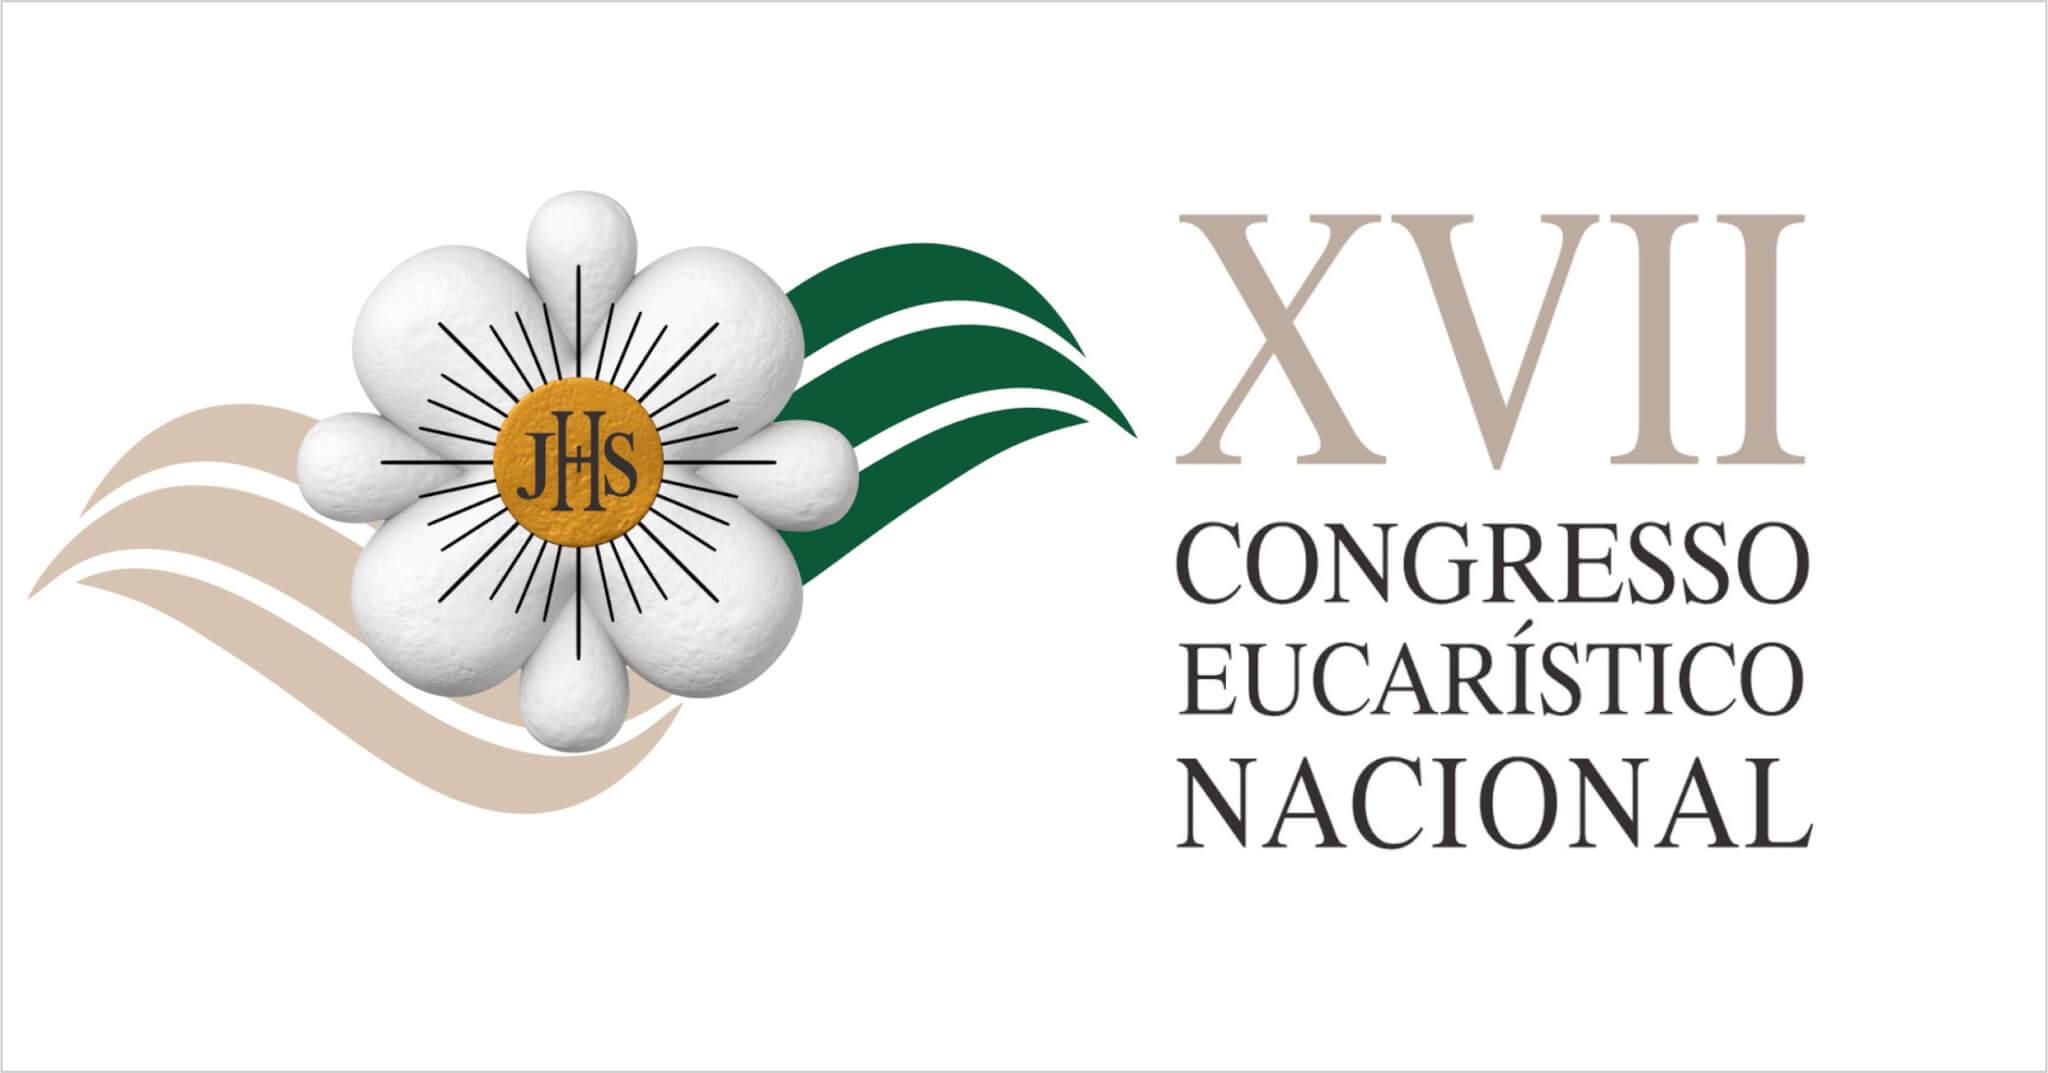 Congresso Eucarístico Nacional de Belém